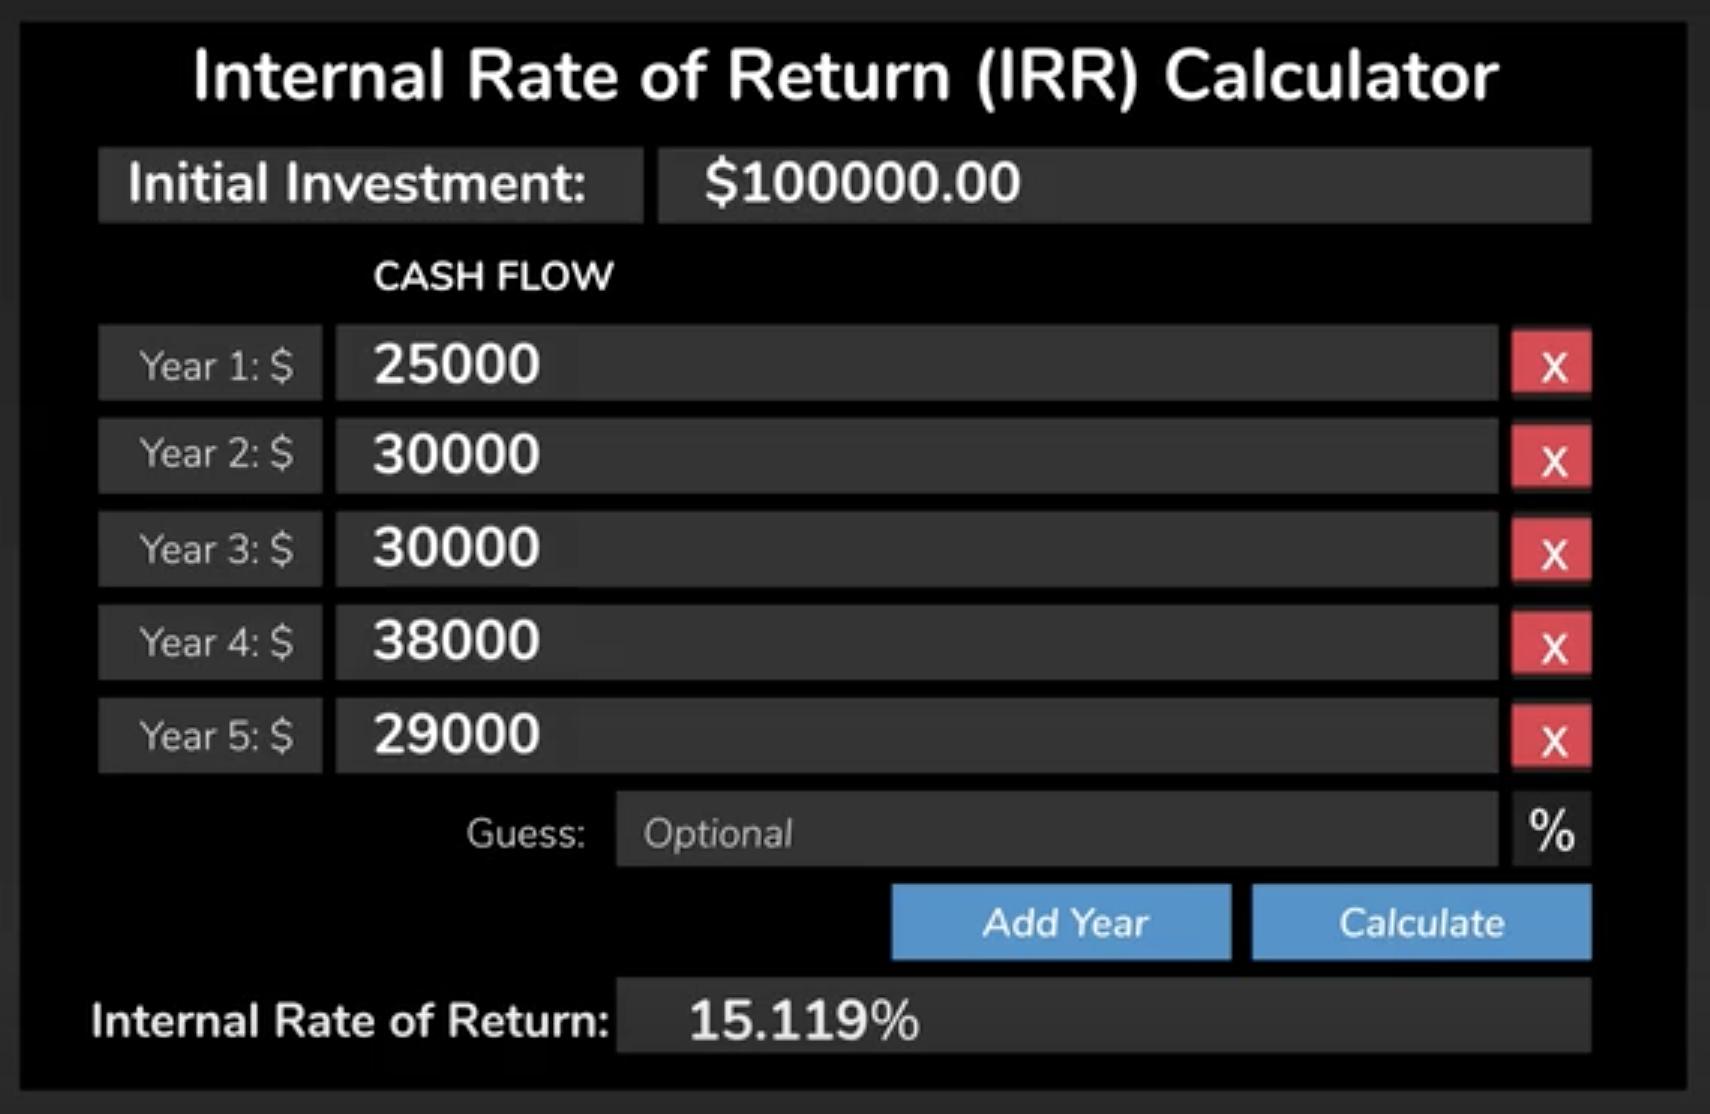 Internal Rate of Return Calculator